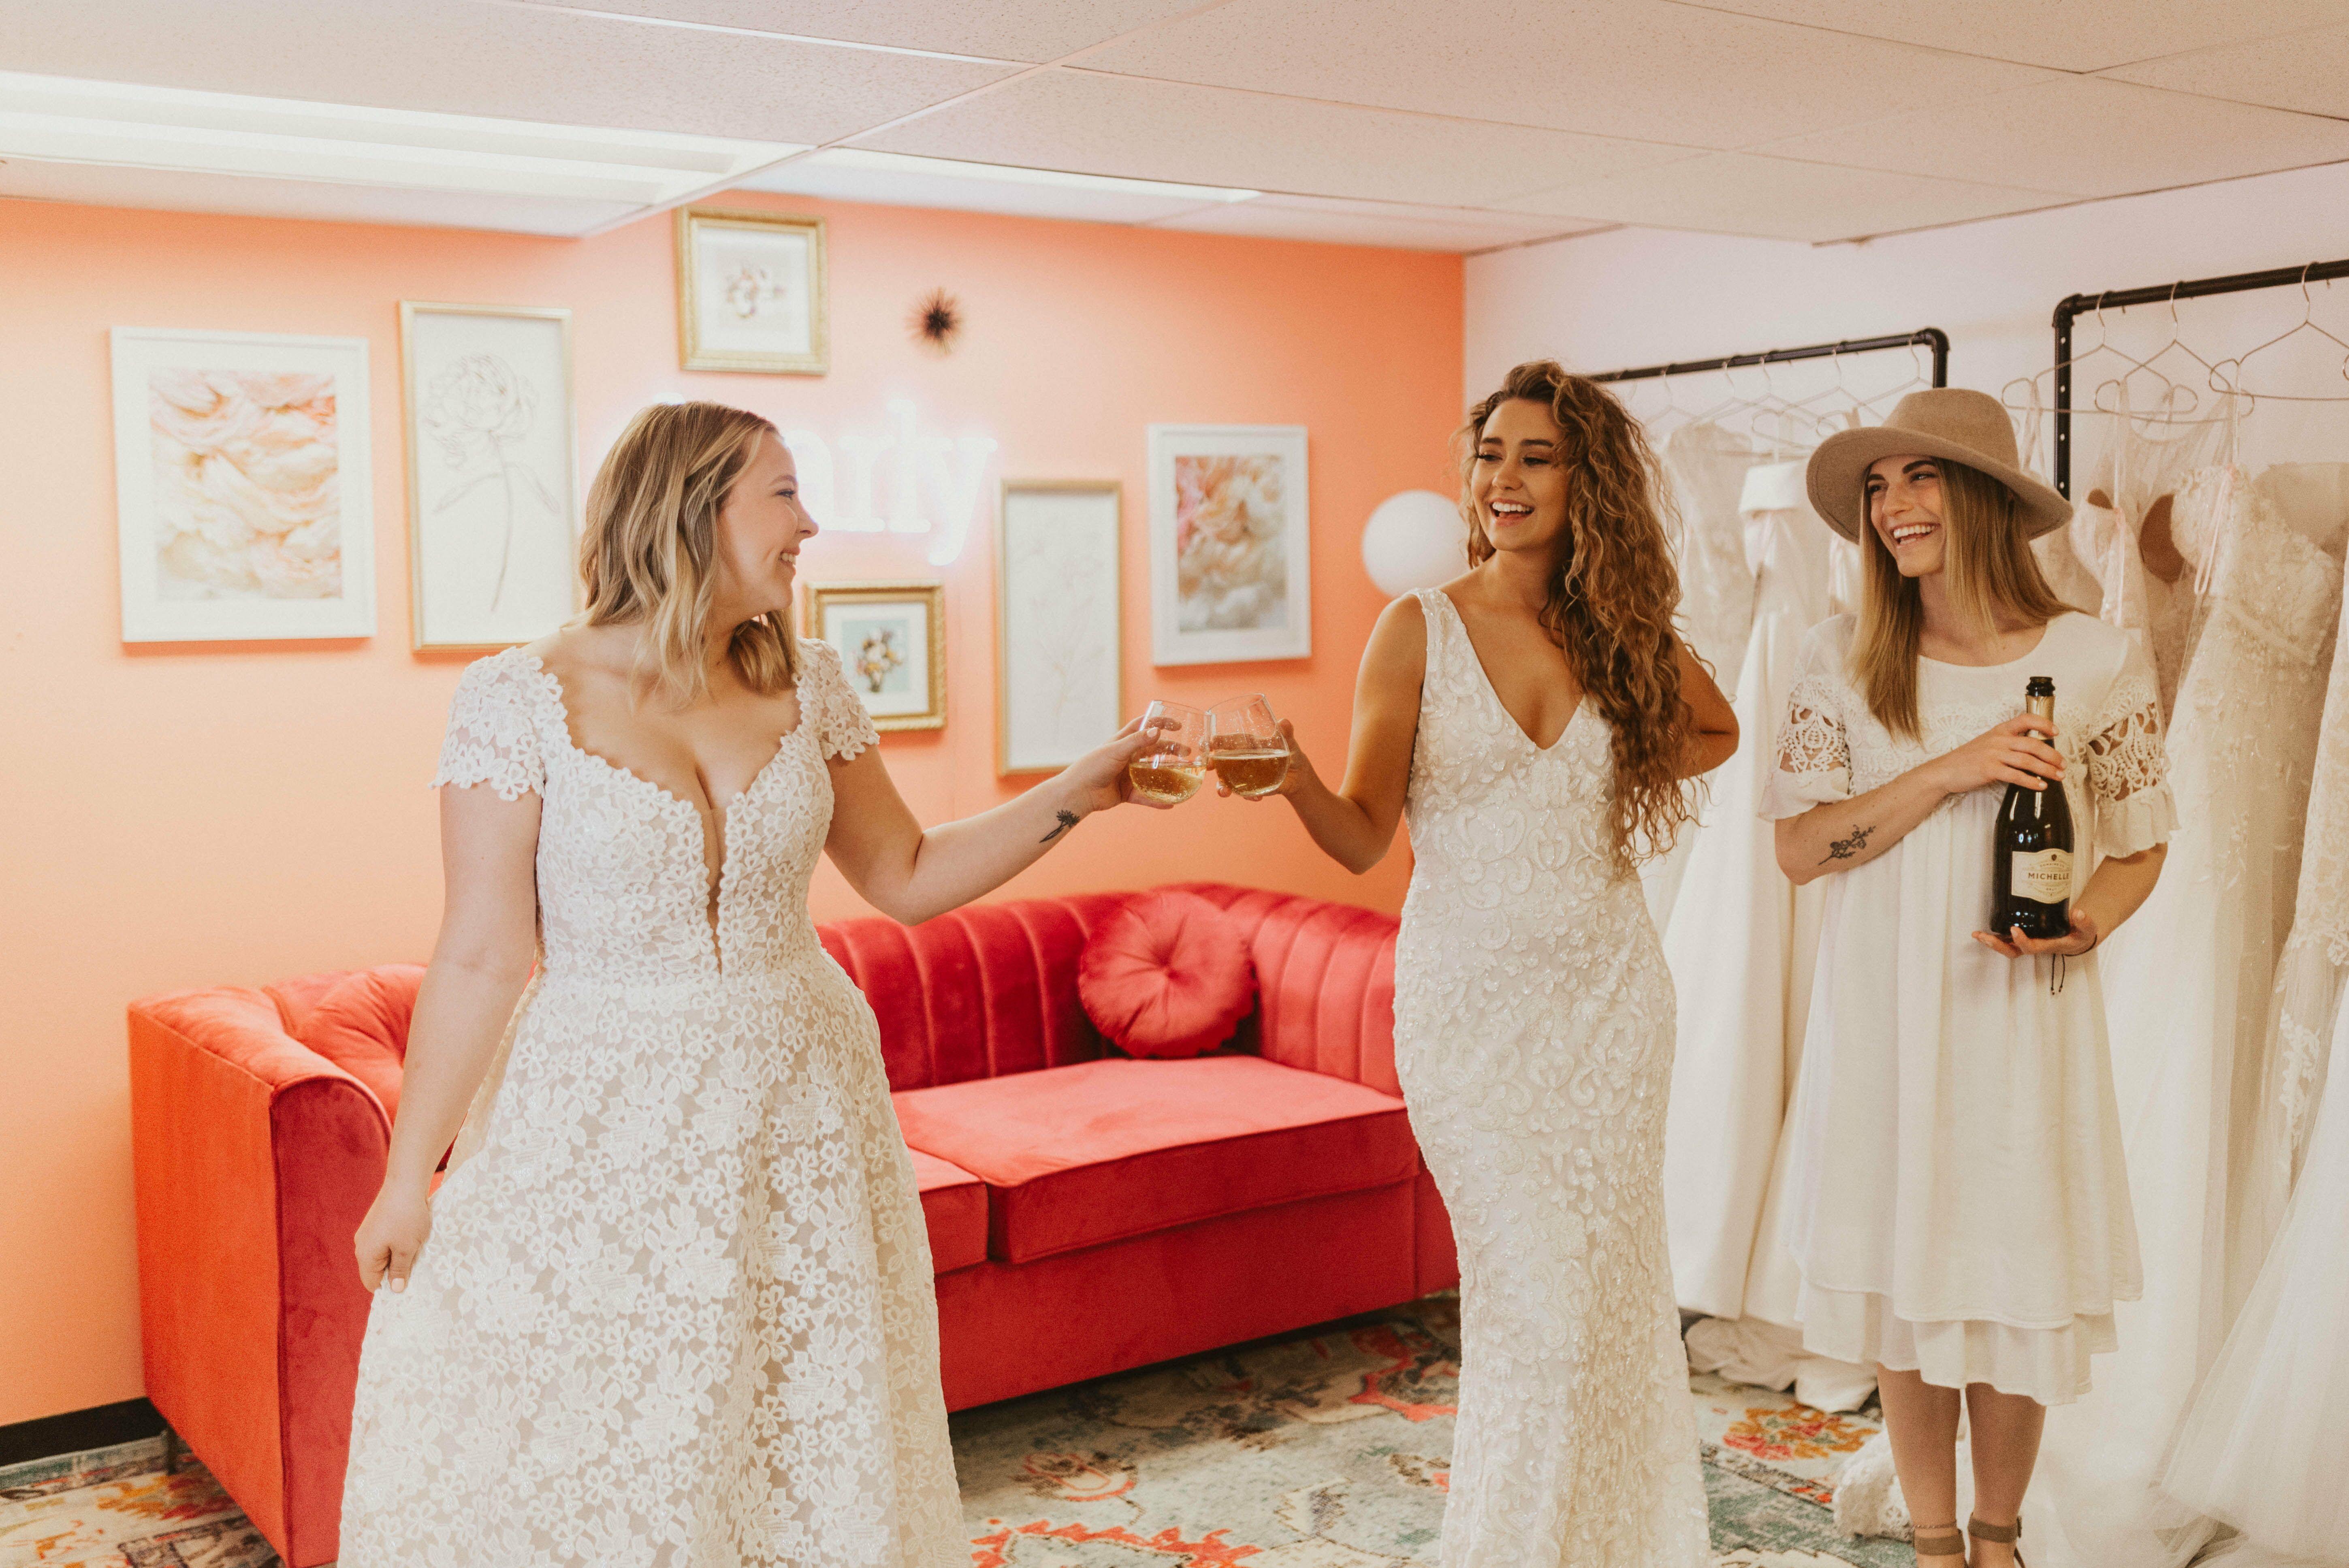 Bridal Salons in Yakima, WA   The Knot